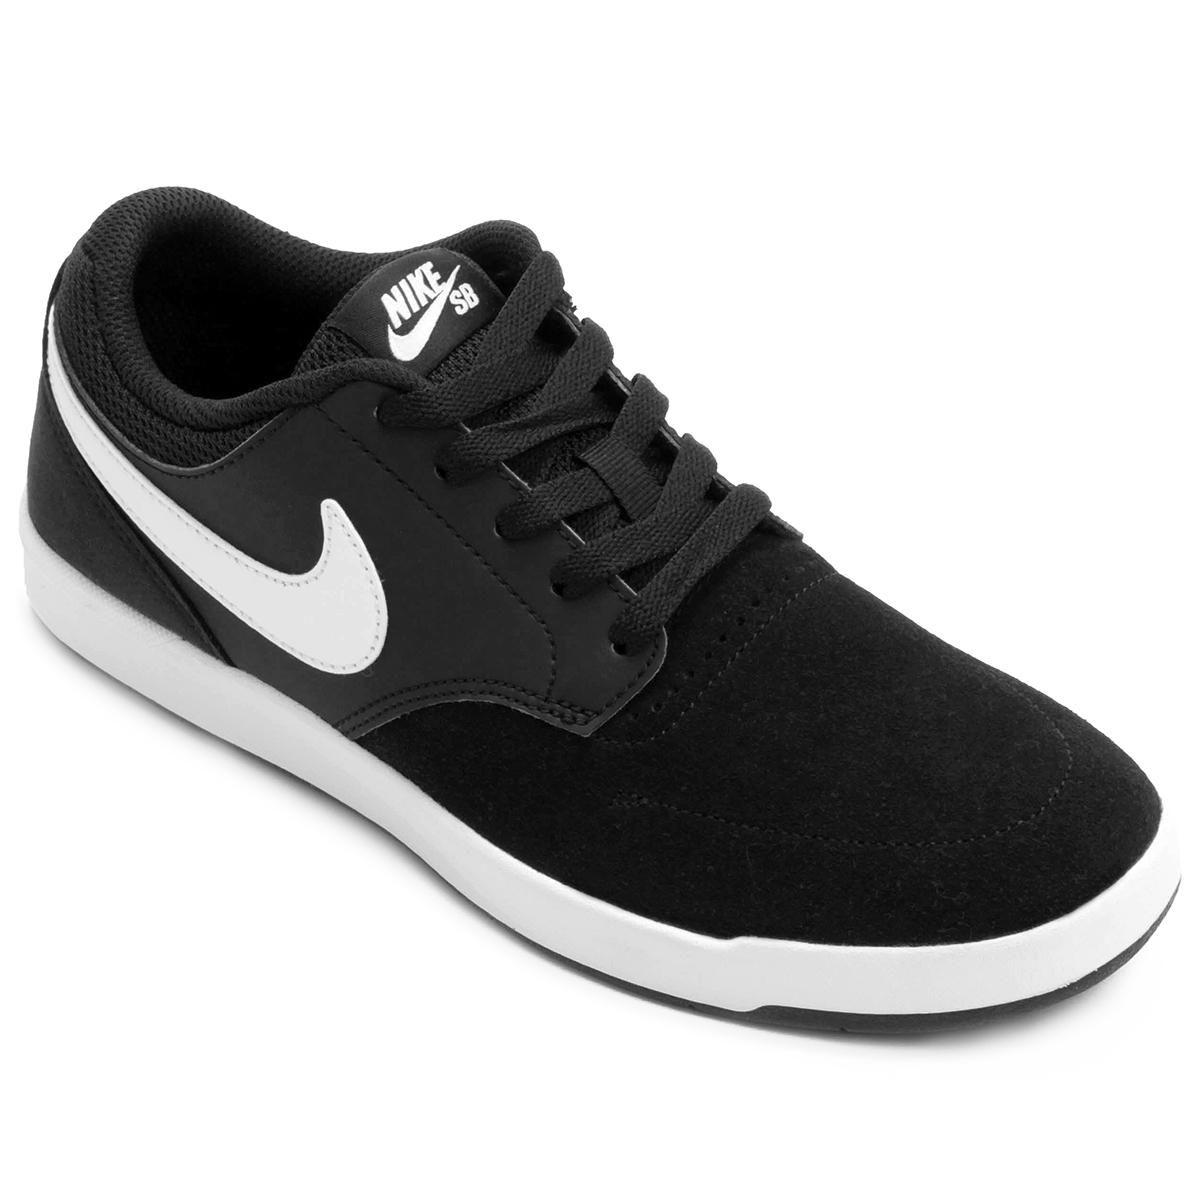 Tênis Masculino Nike Sb Fokus - BRACIA SHOP  Loja de Roupas ... a229e84791591